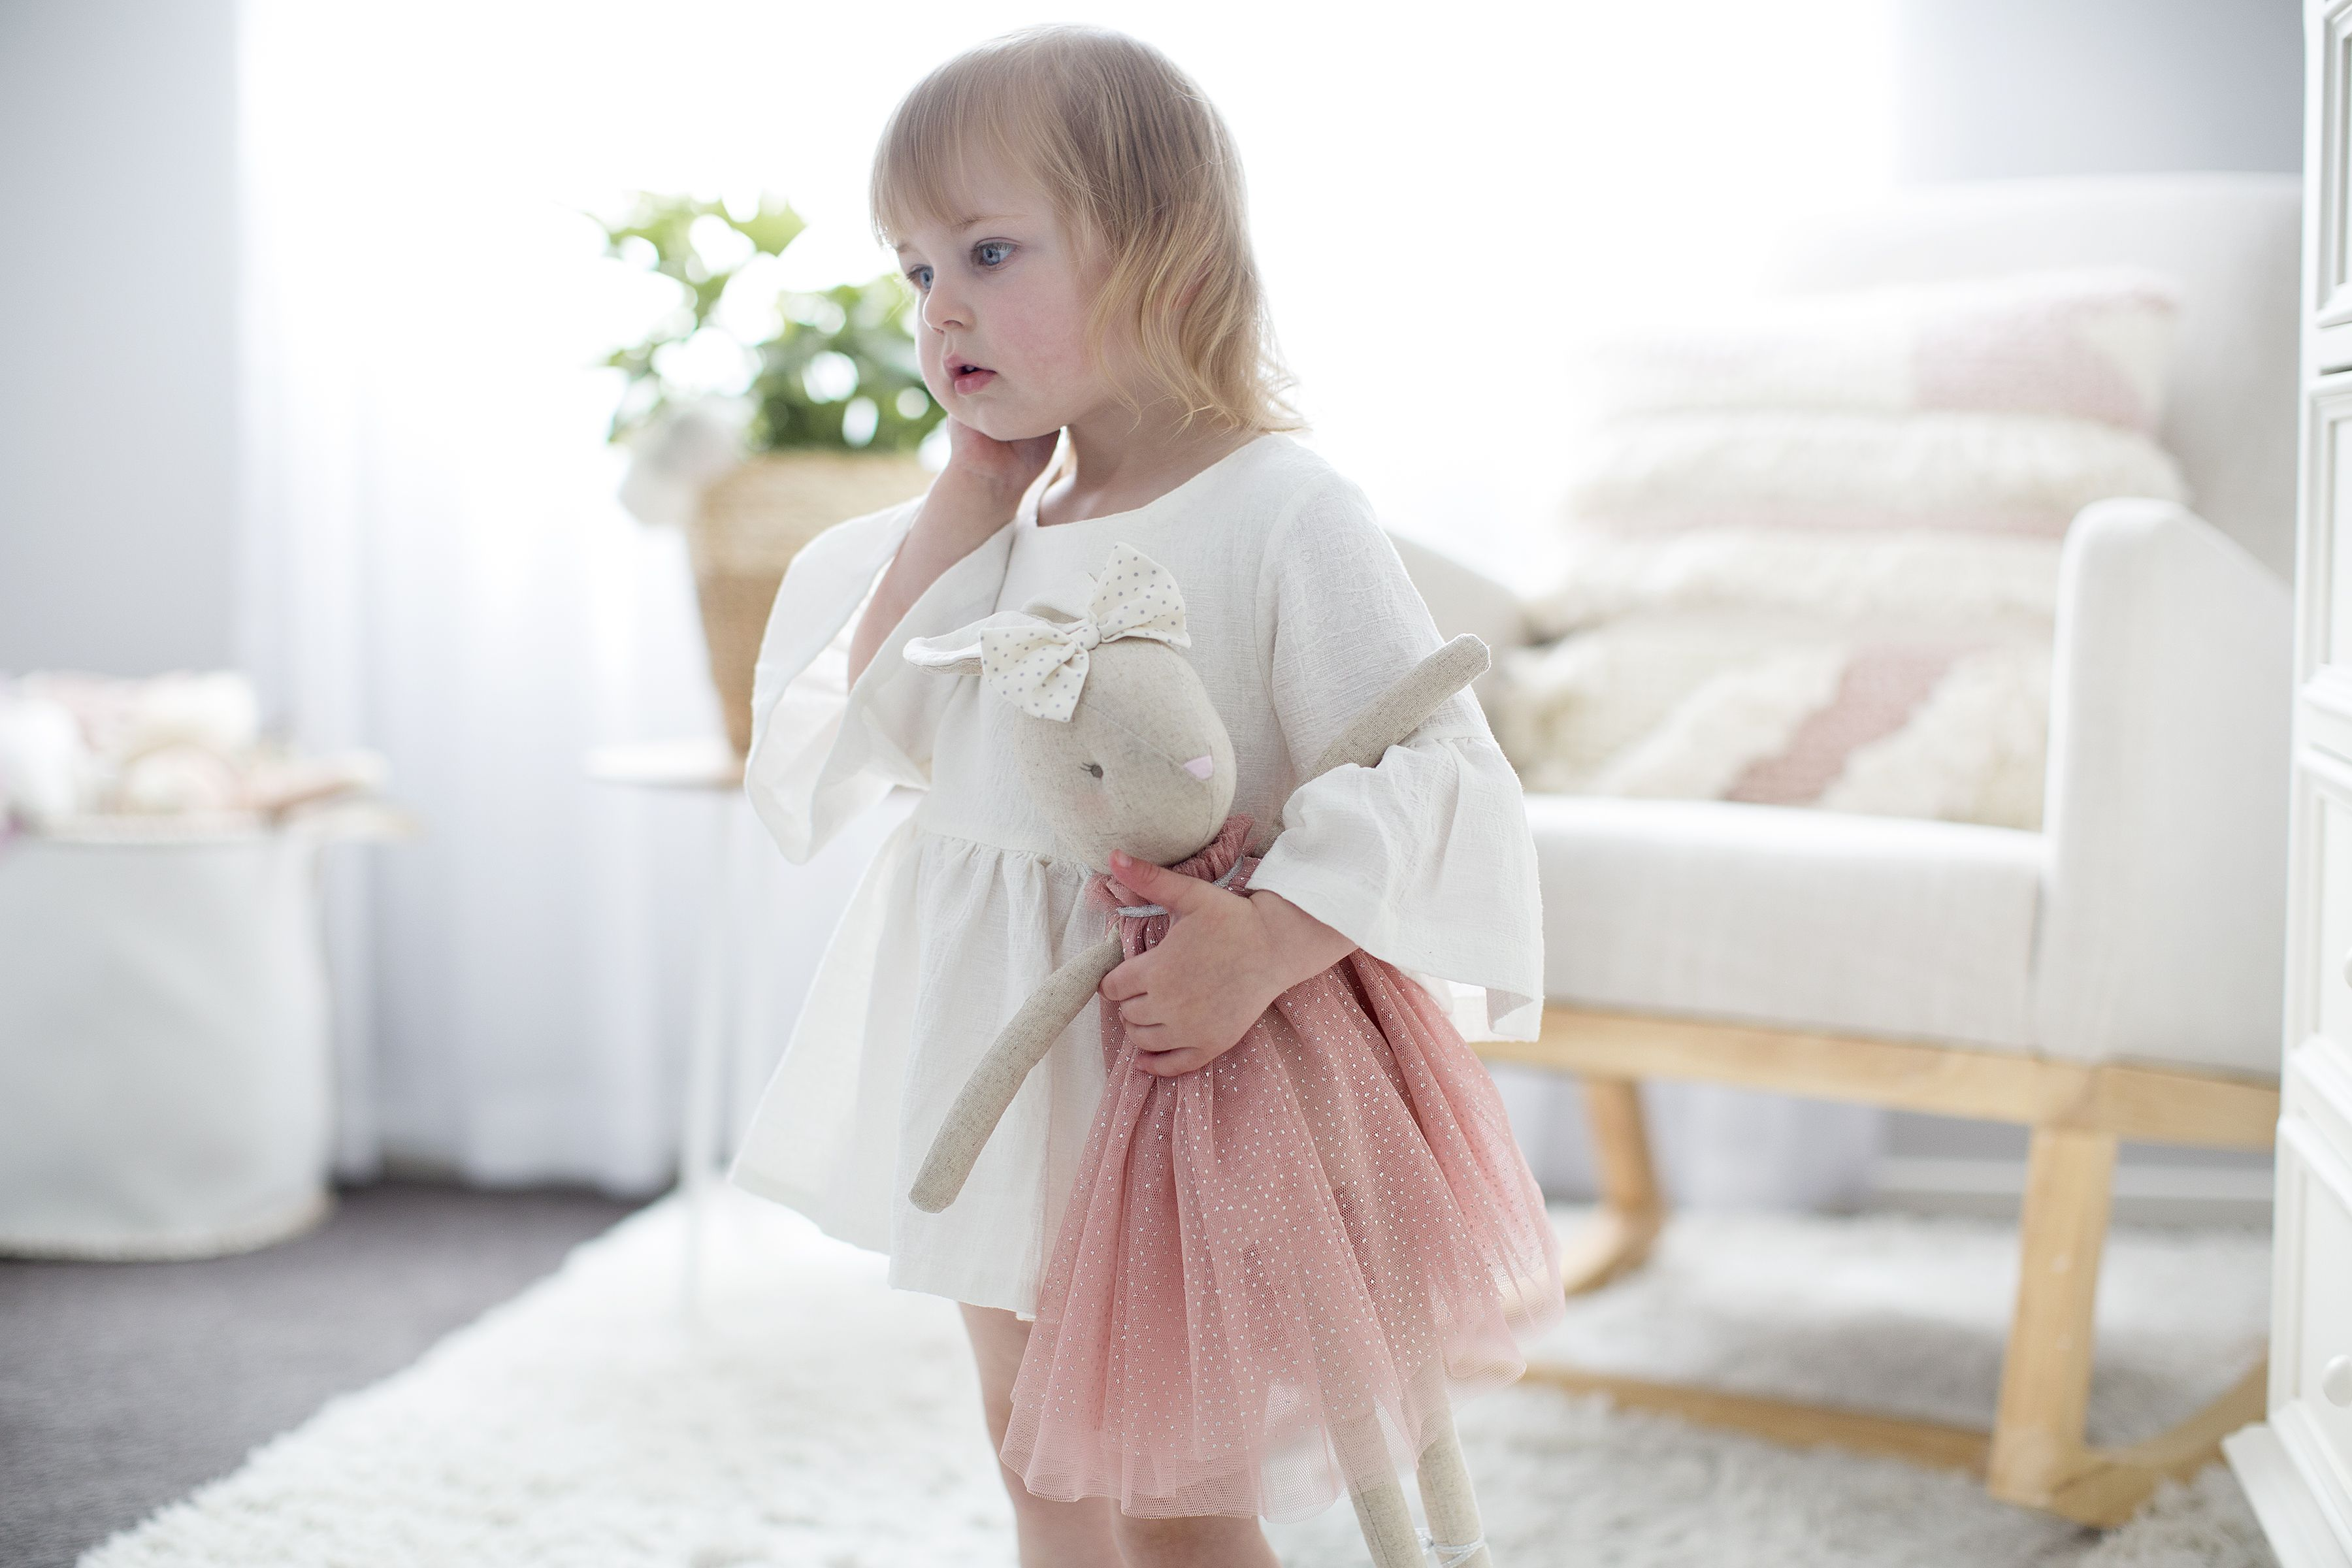 Licht Roze Jurk : Alimrose daisy konijnenpop 48 cm blush. ook verkrijgbaar met